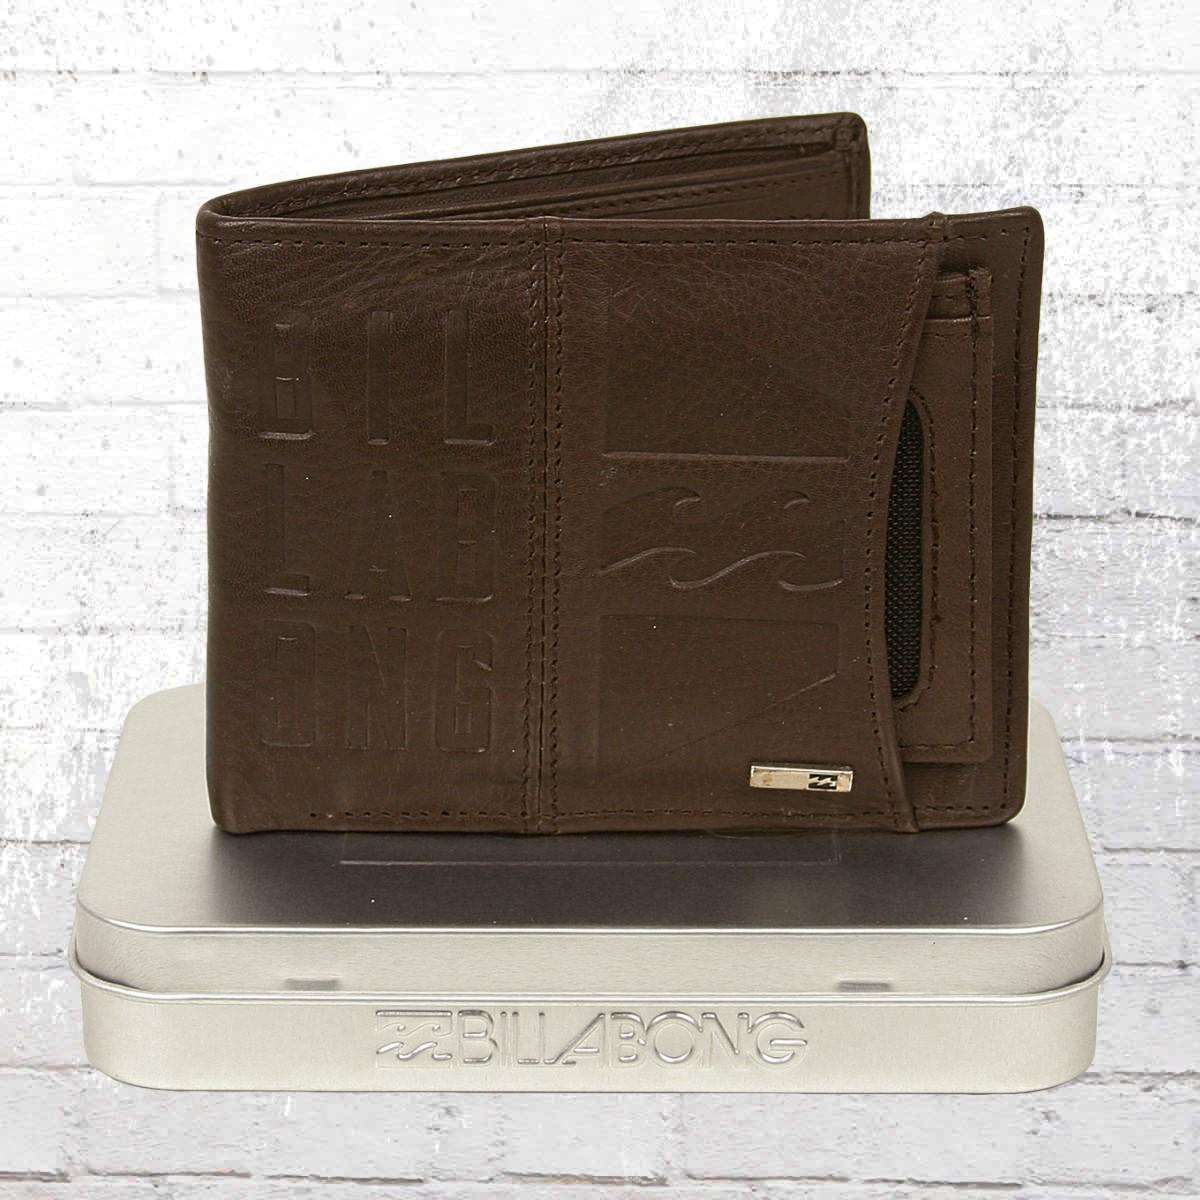 51c8d98f7 Order now | Billabong Men Purse Scope Leather Wallet brown